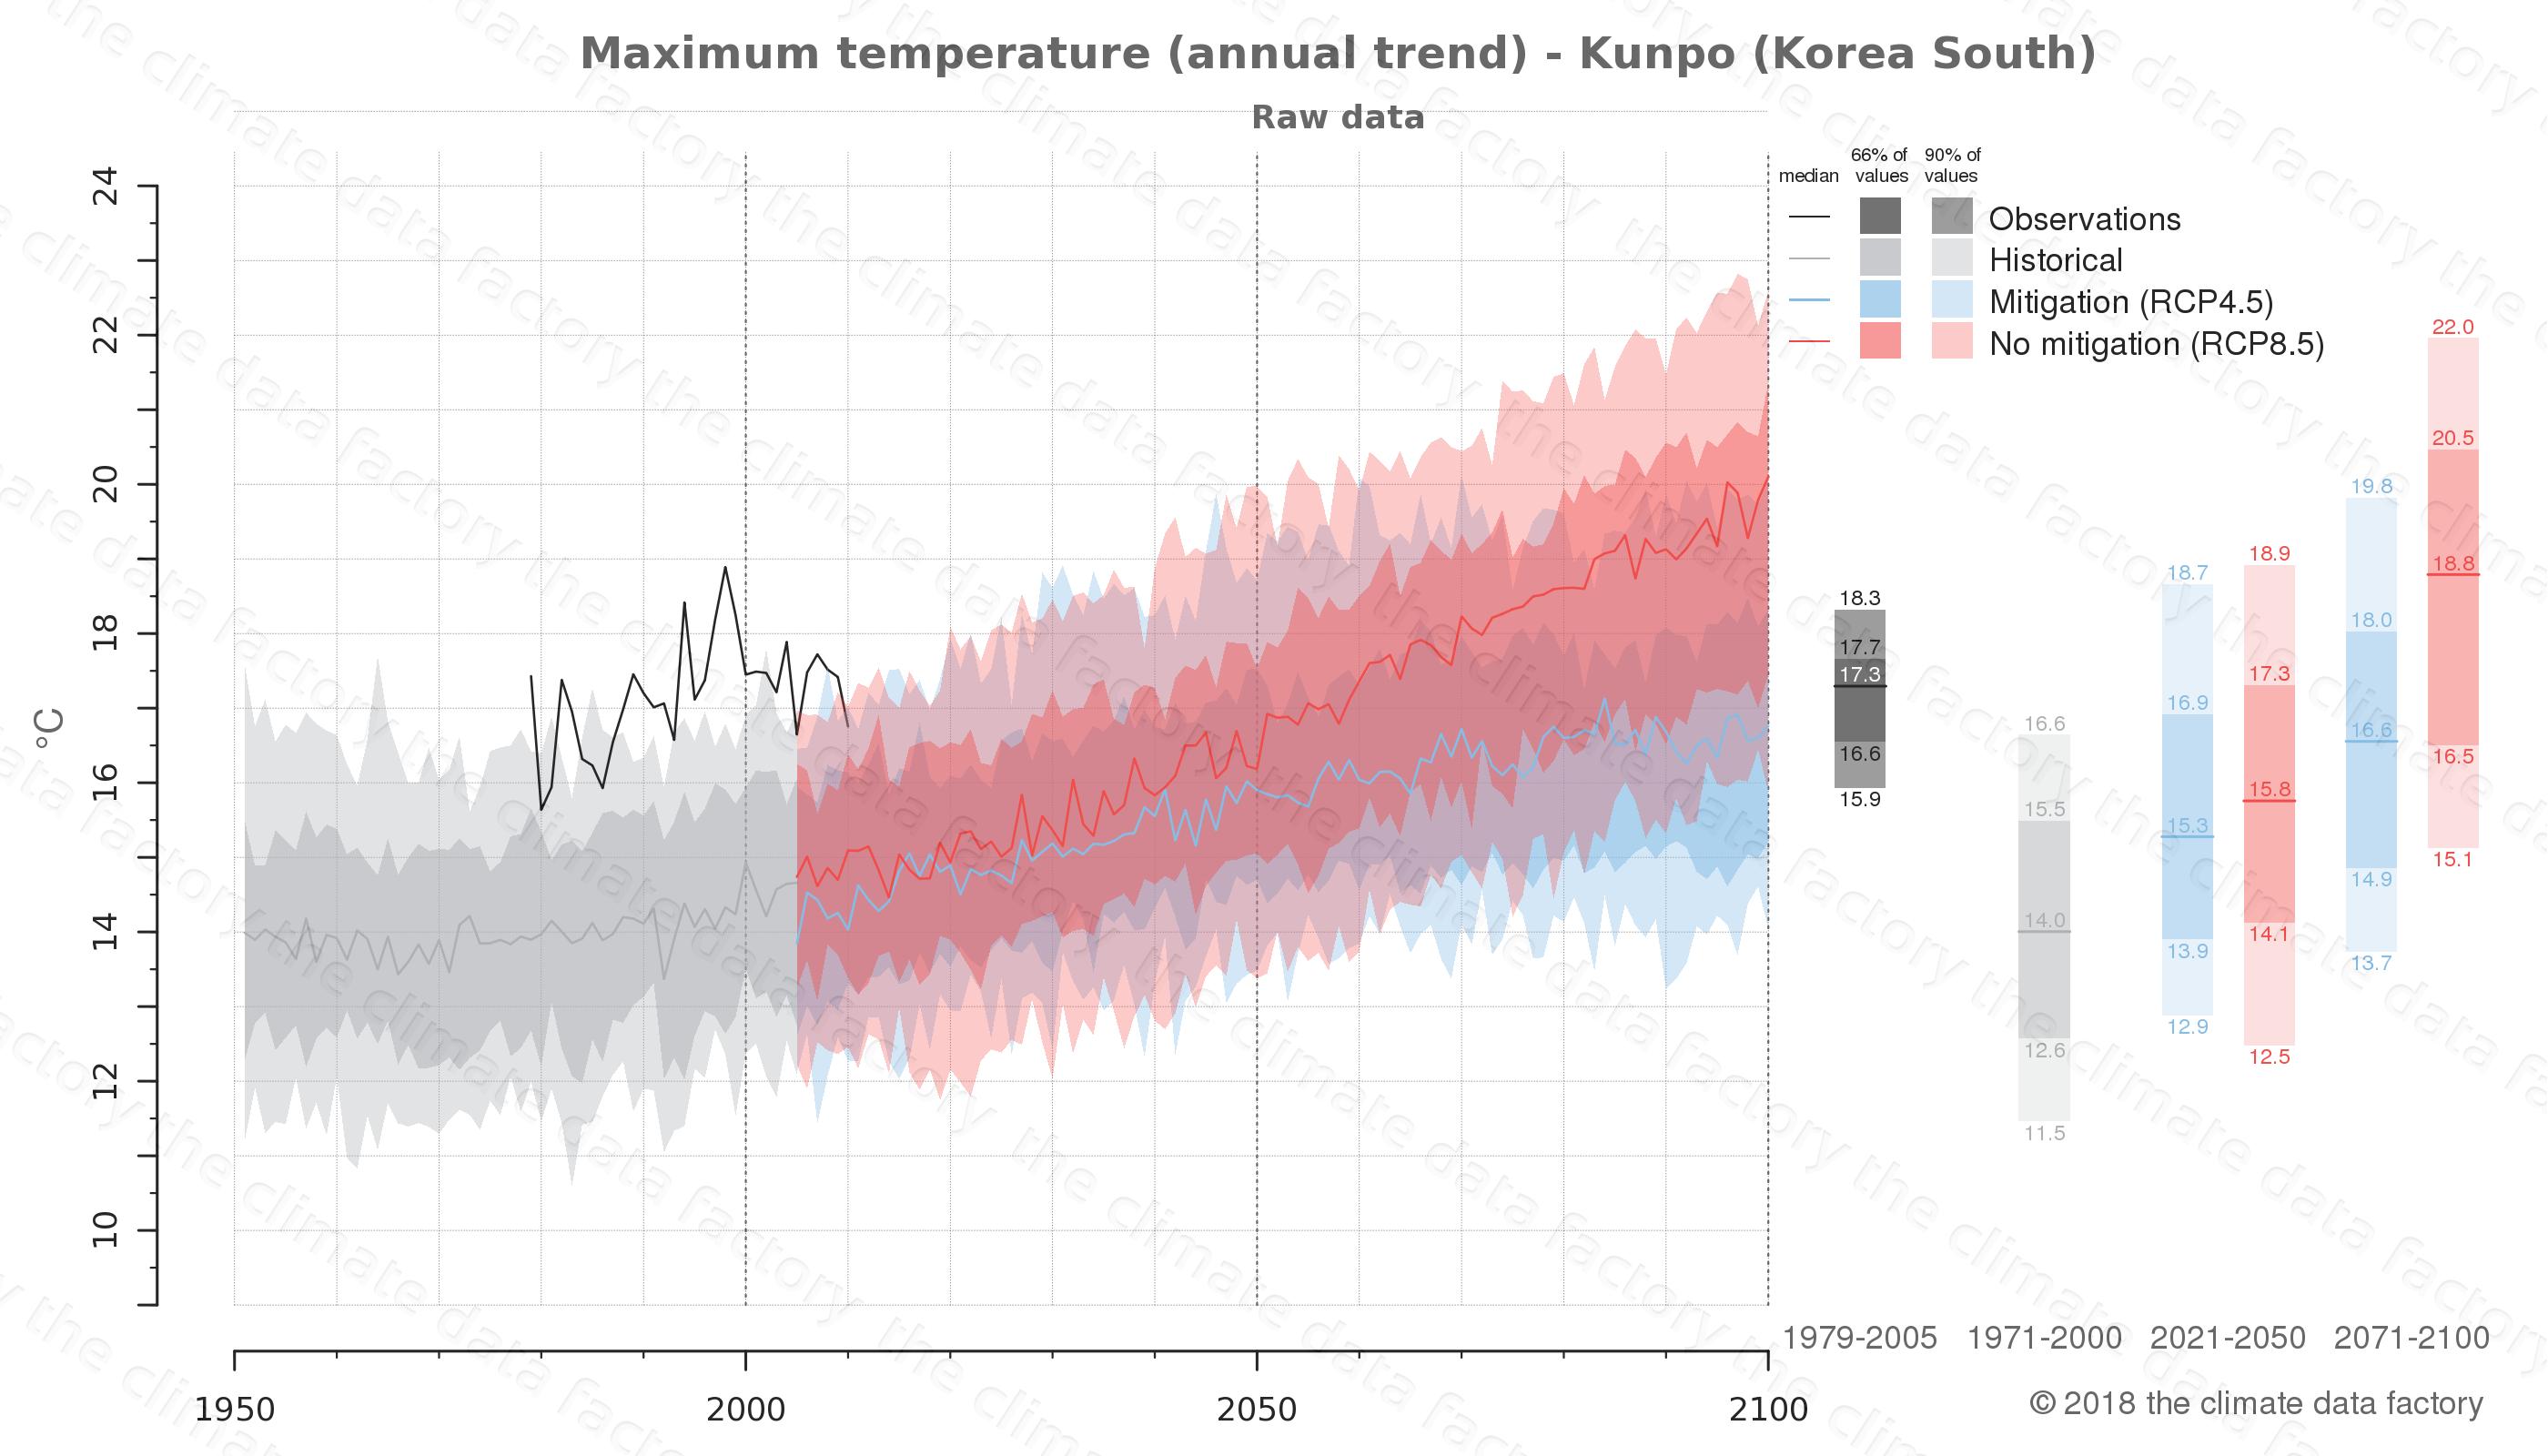 climate change data policy adaptation climate graph city data maximum-temperature kunpo south korea